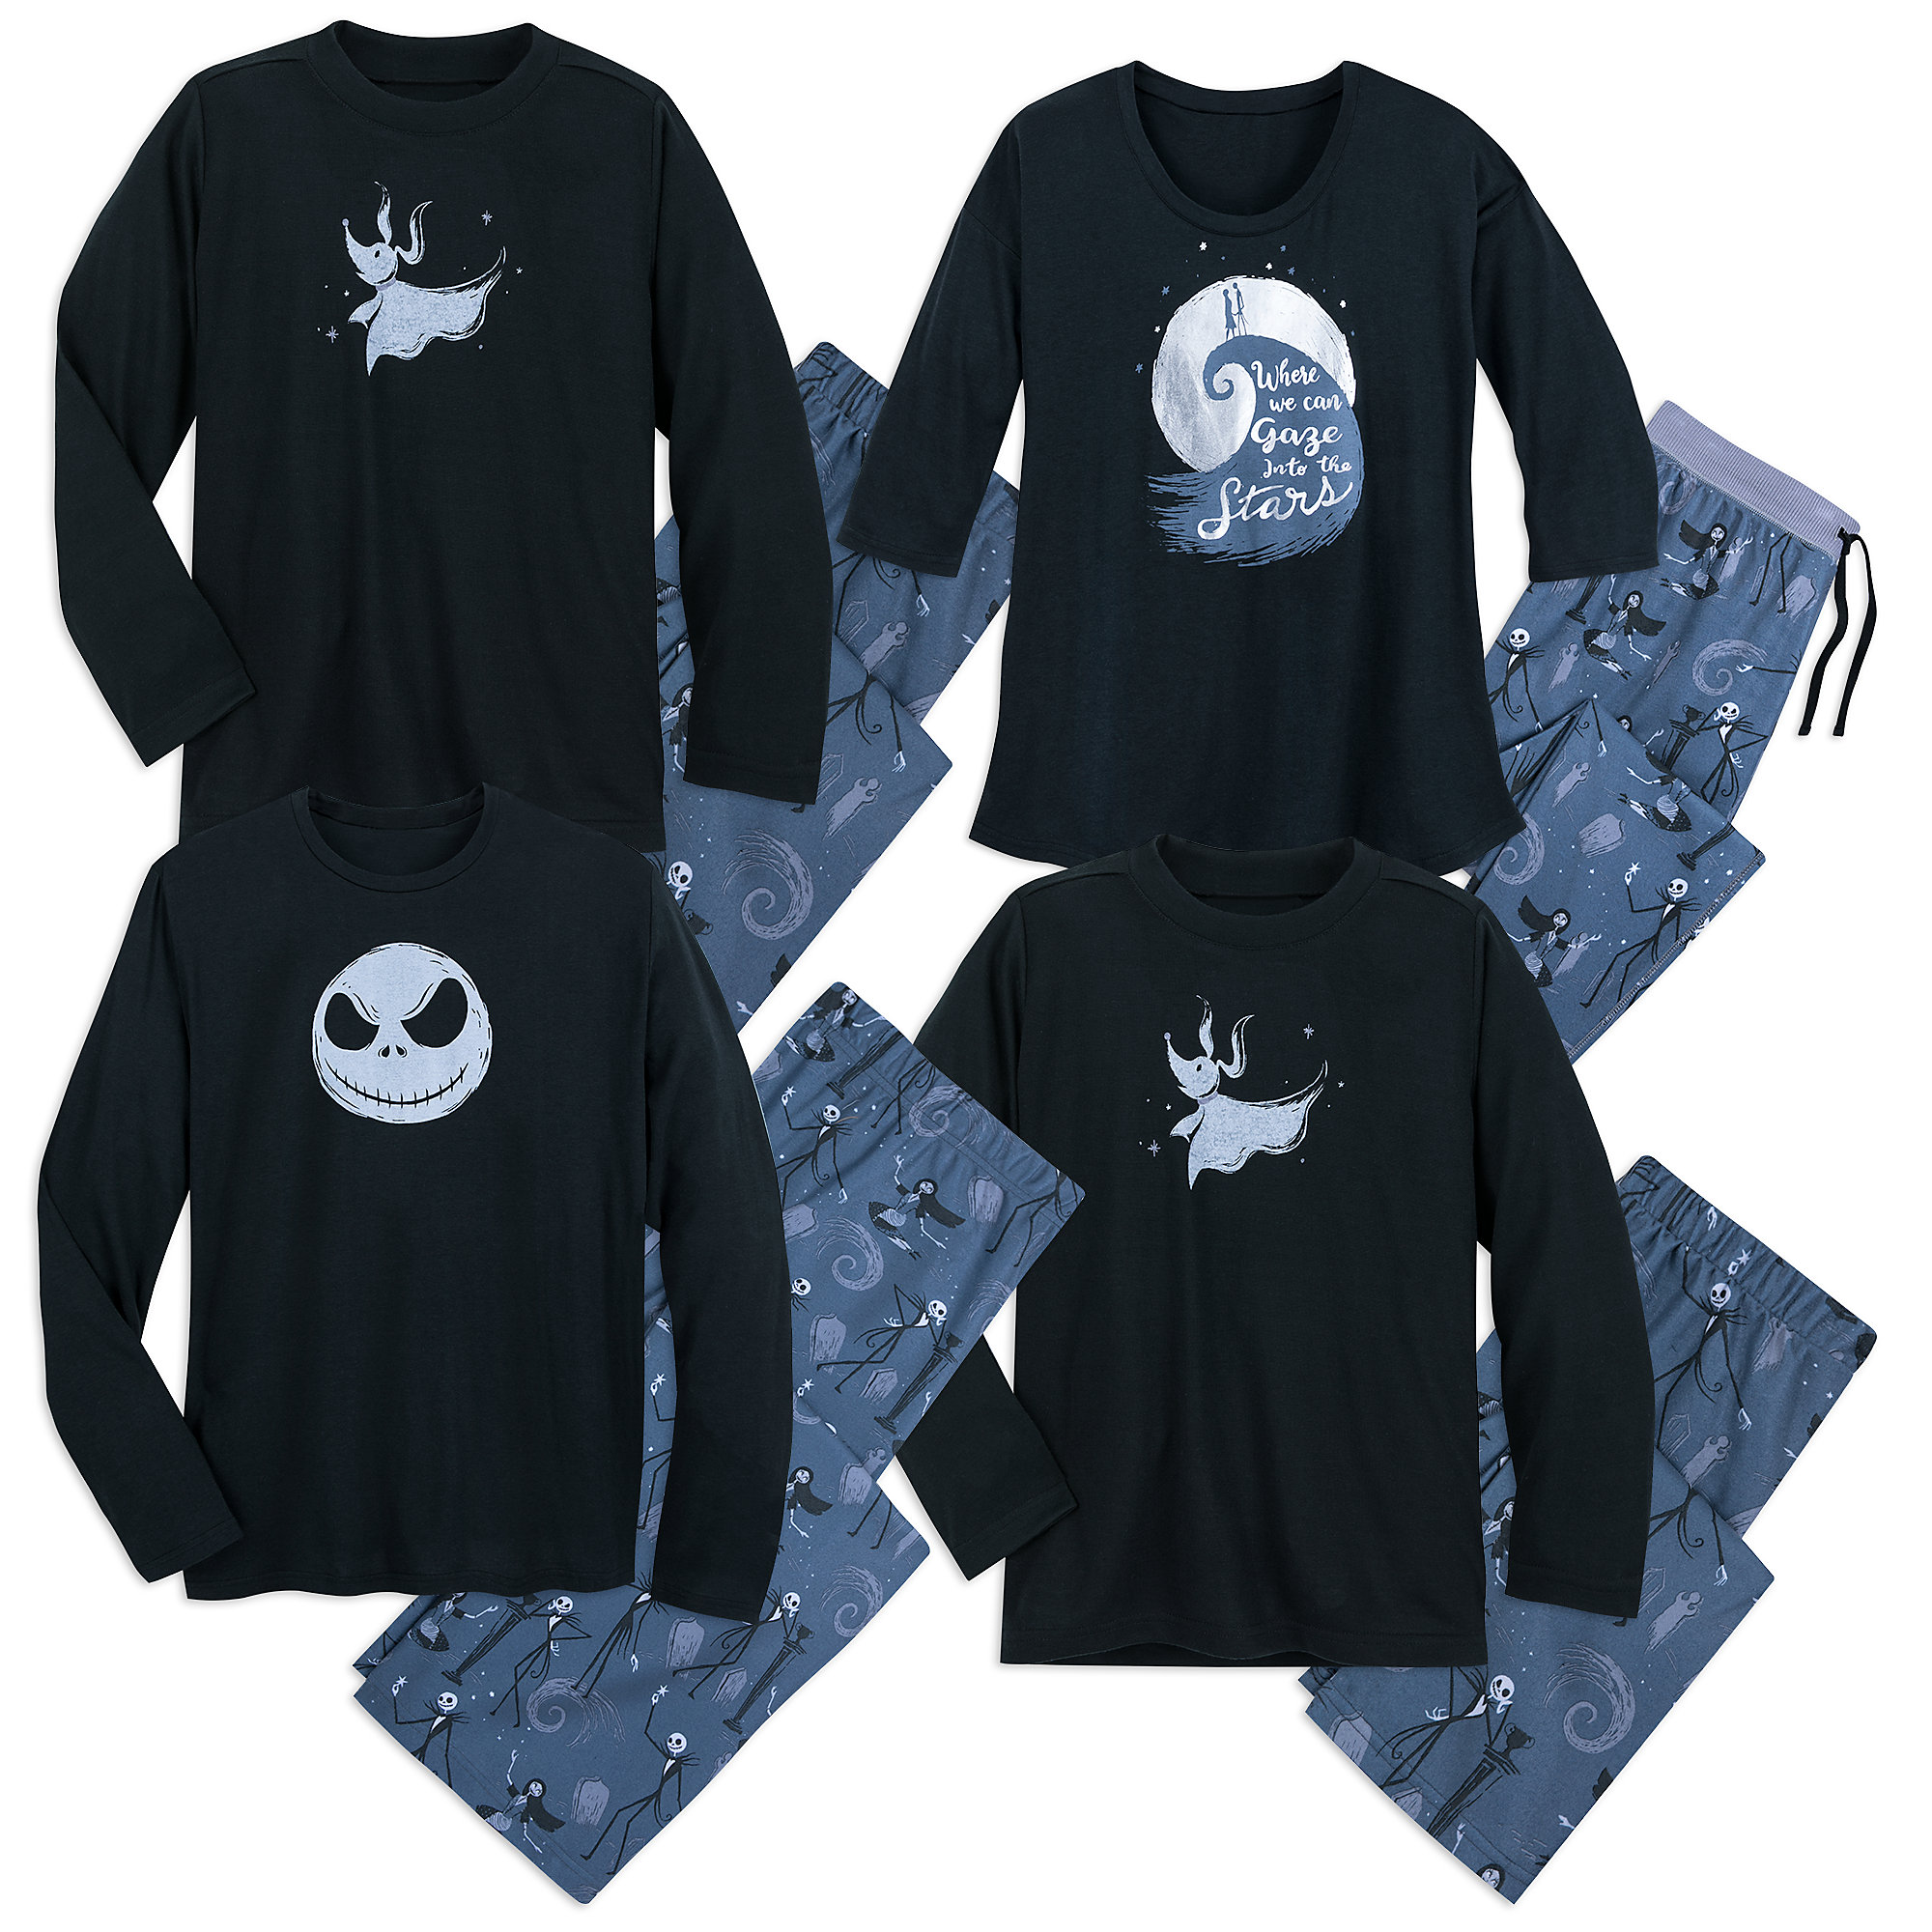 Tim Burton's The Nightmare Before Christmas Family Sleepwear Collection - Munki Munki